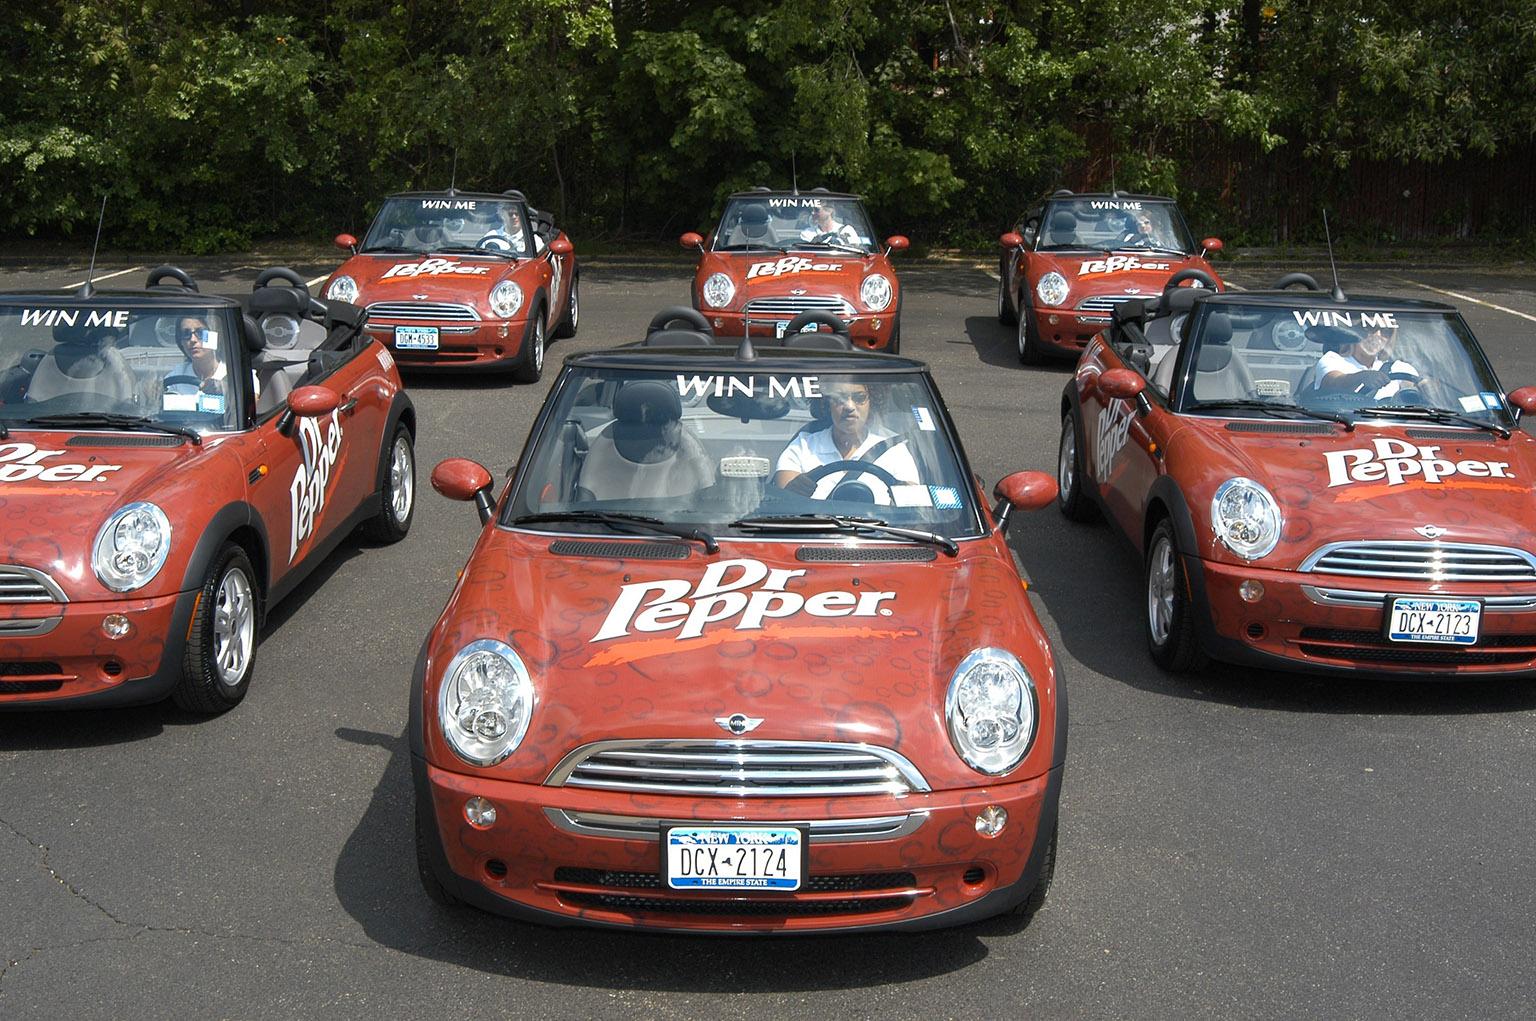 Dr Pepper: Drive II Tour – 2